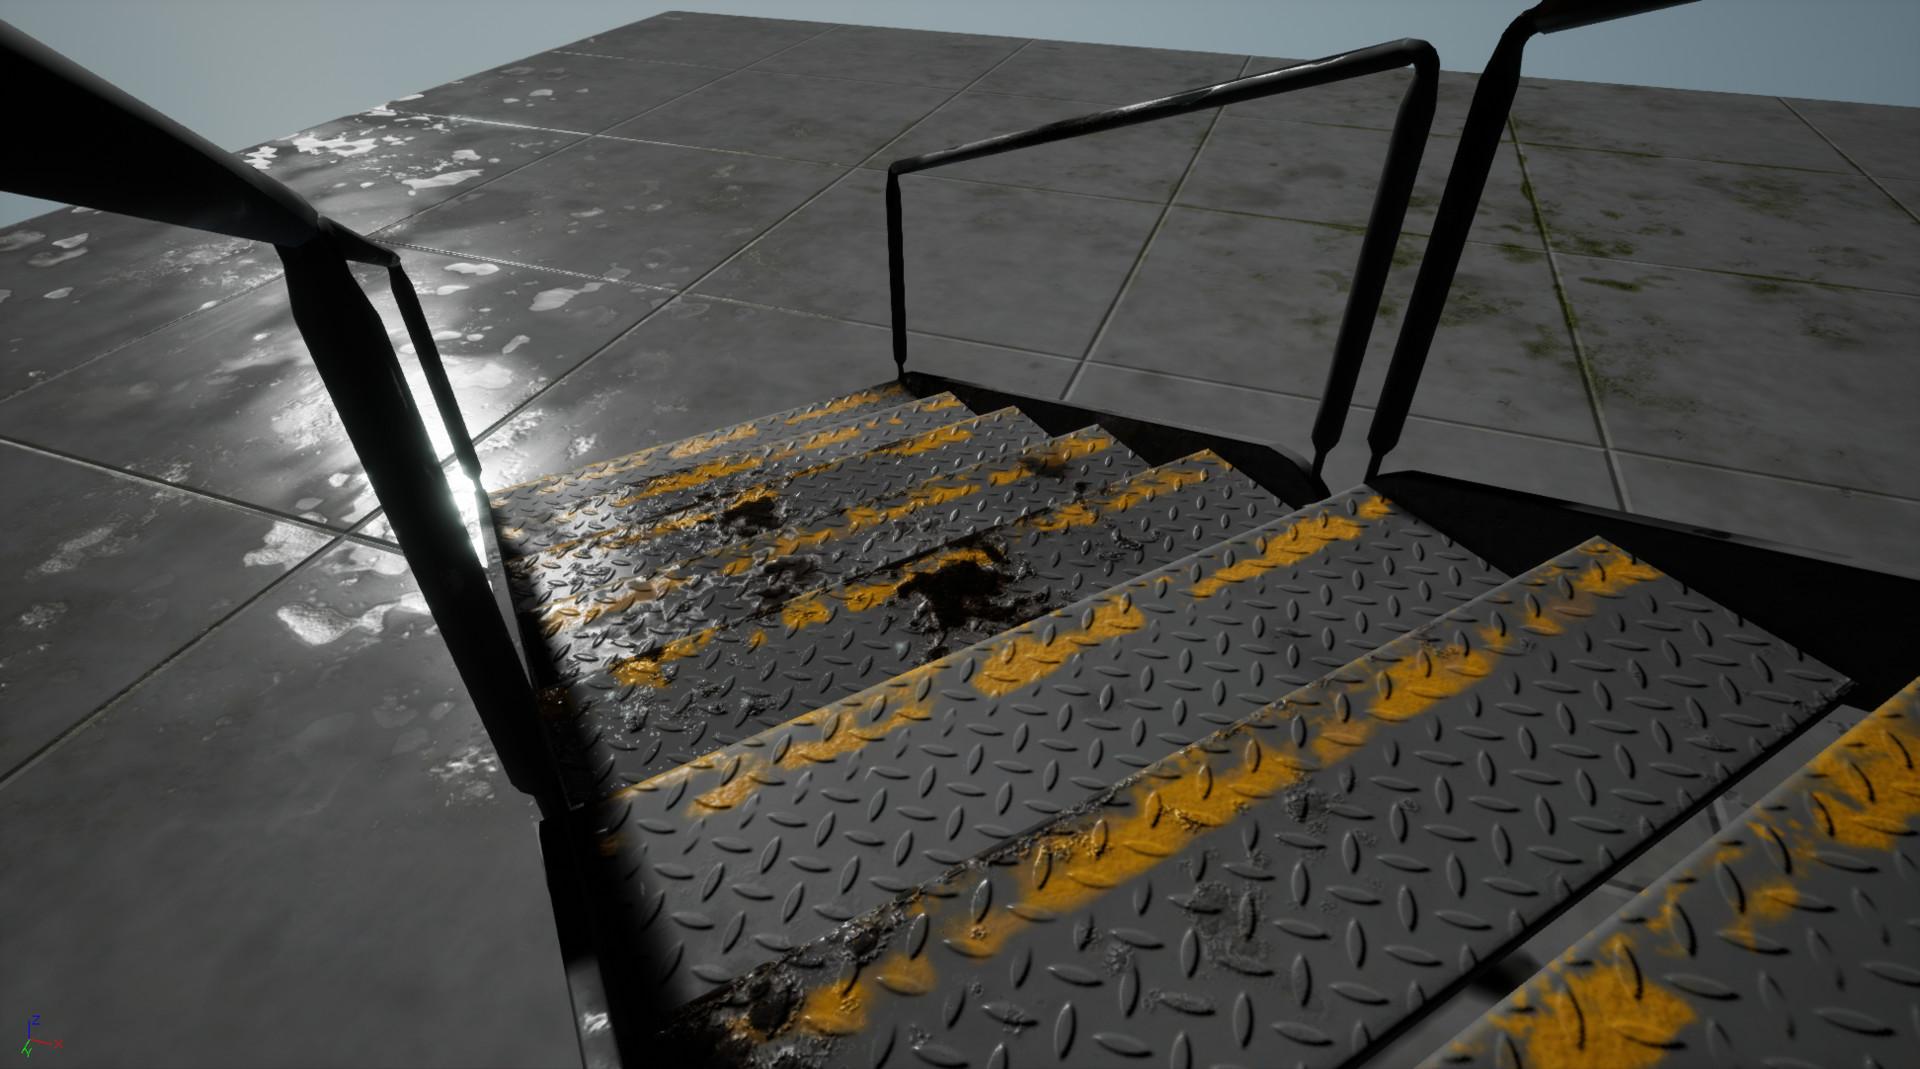 Lloyd james stairs screenshot 3